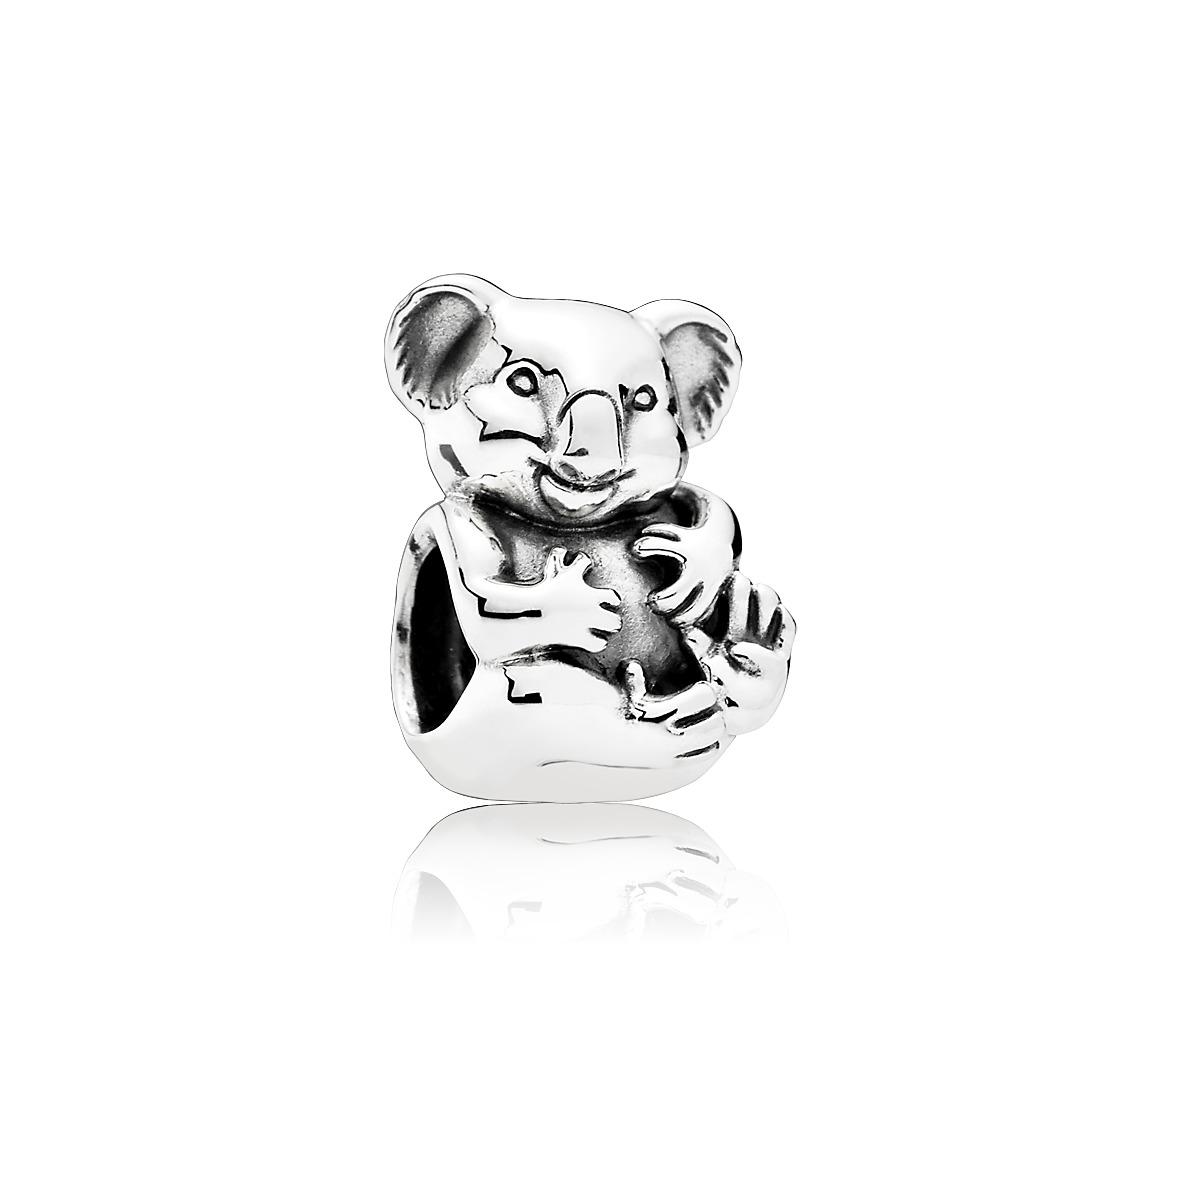 Cuddly Koala Charm